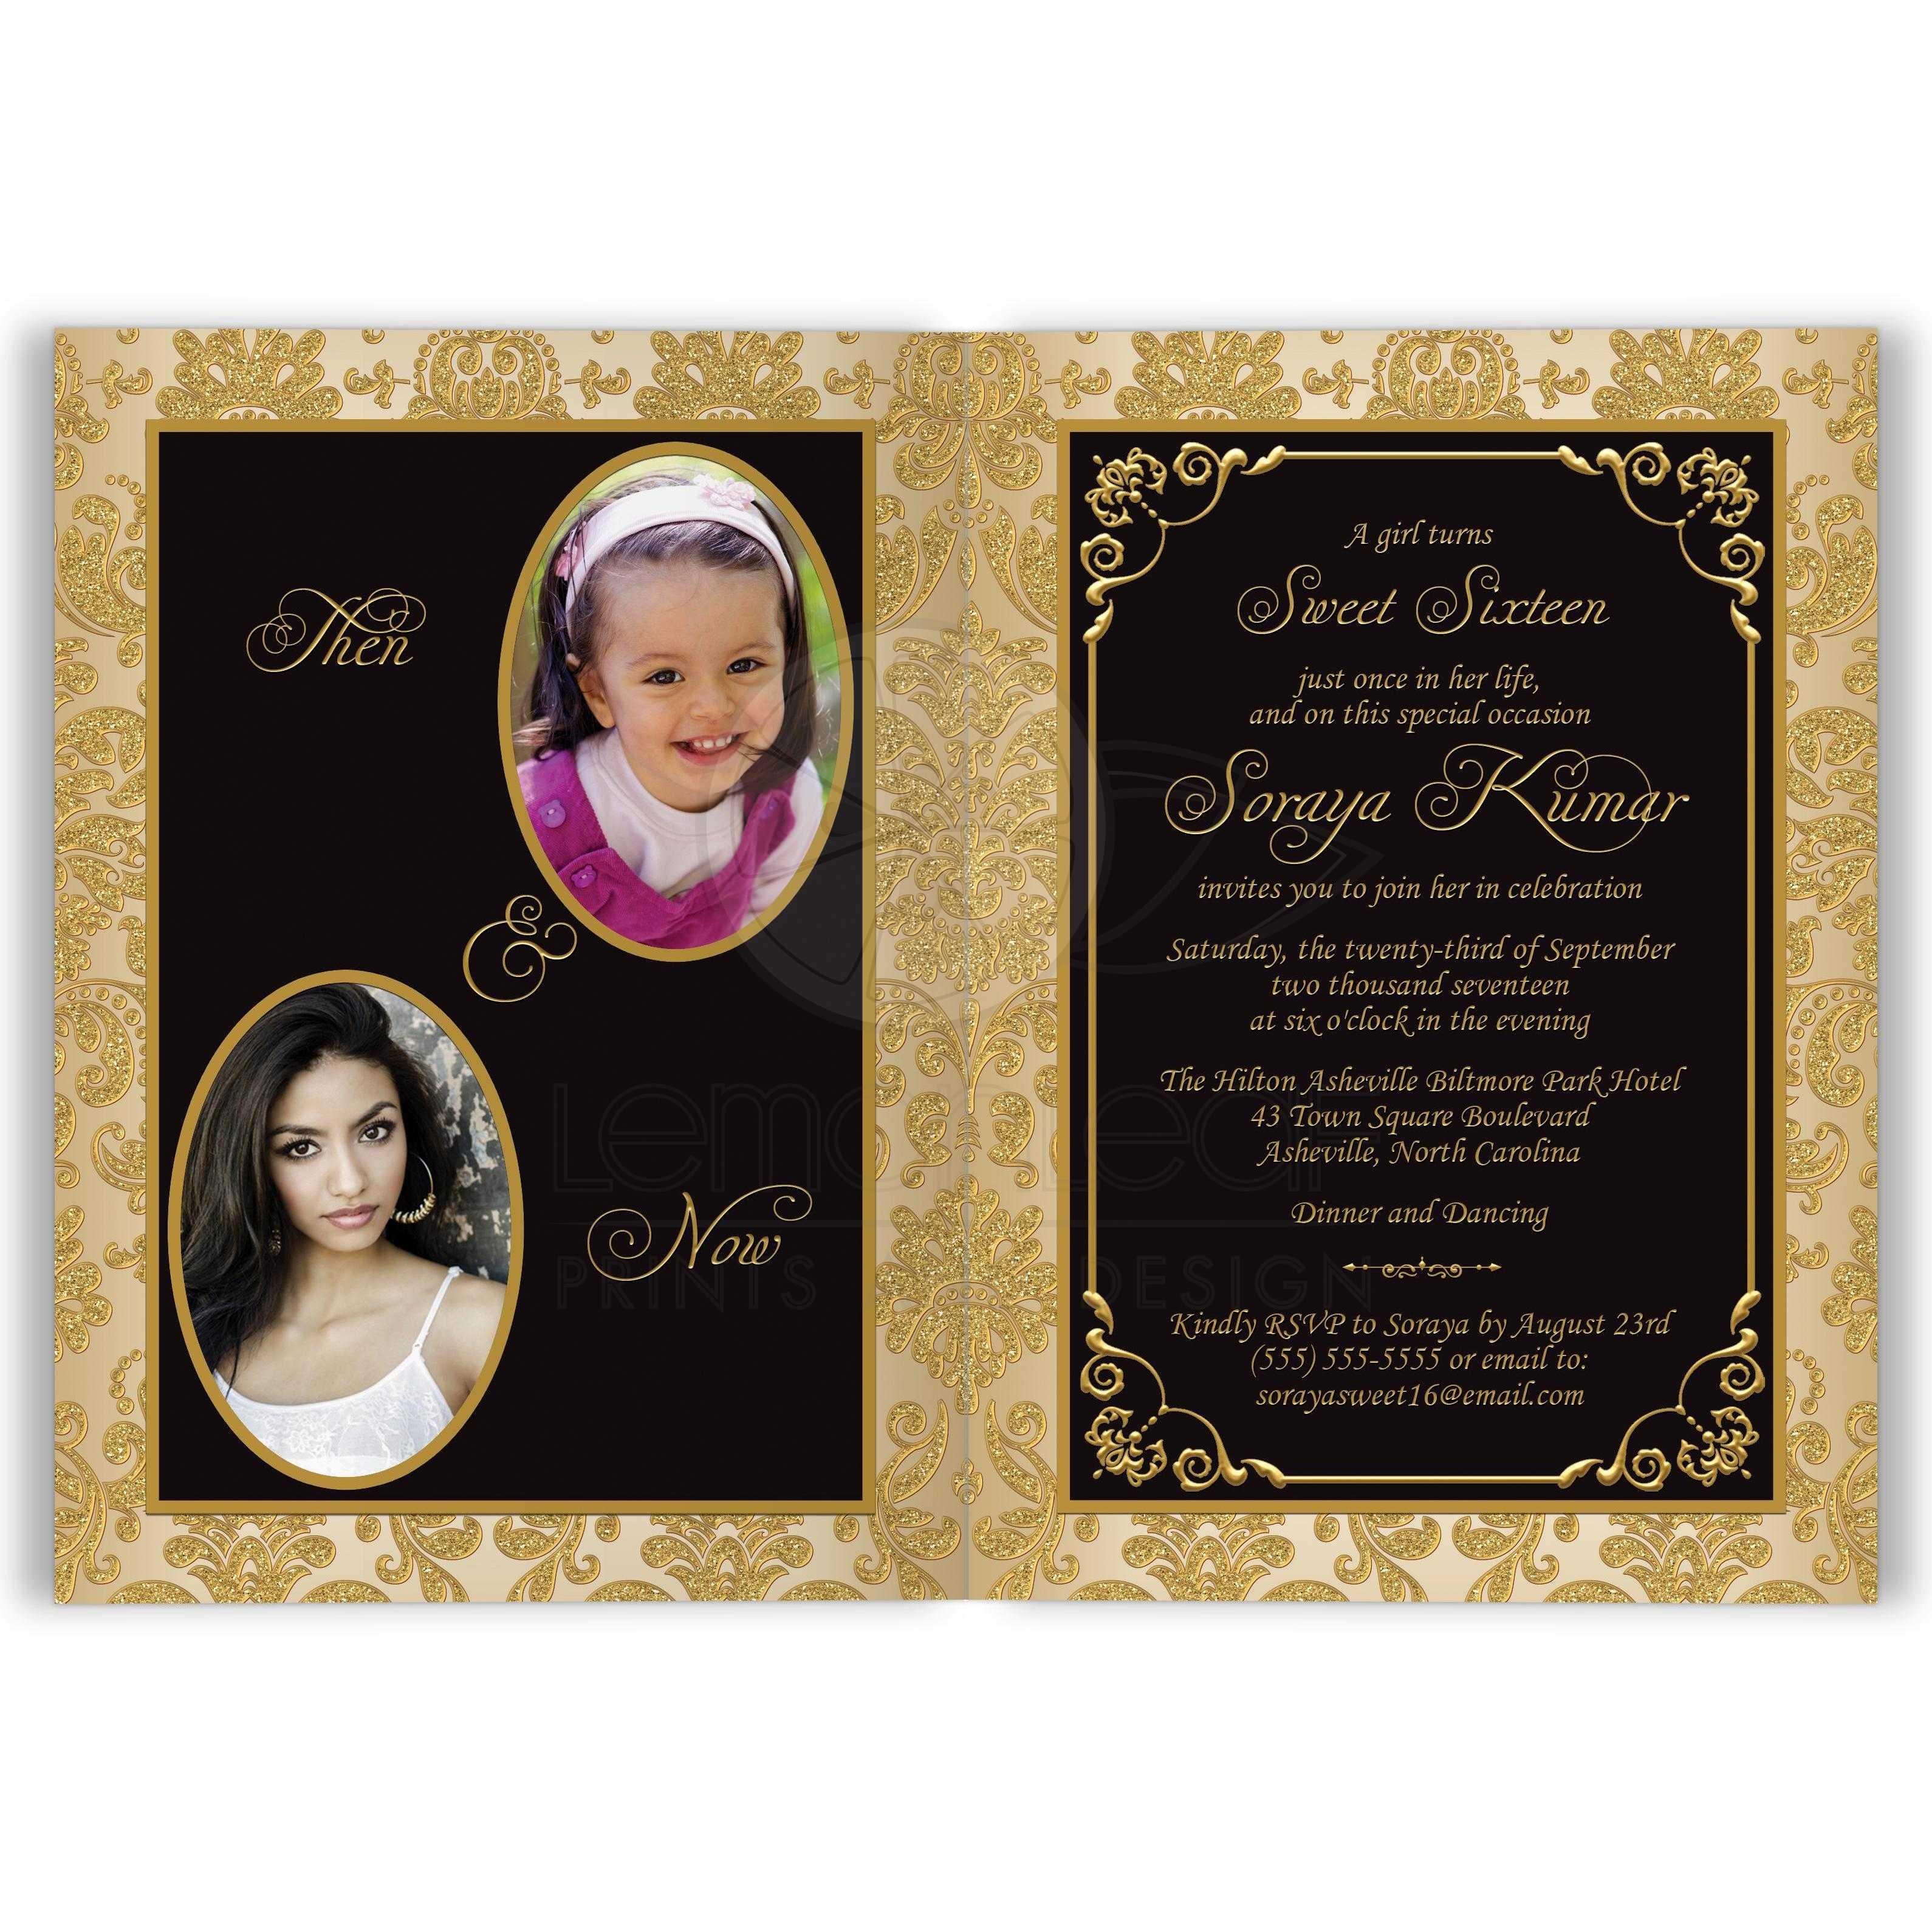 sweet 16th birthday invitation card optional photos black and gold damask scrolls